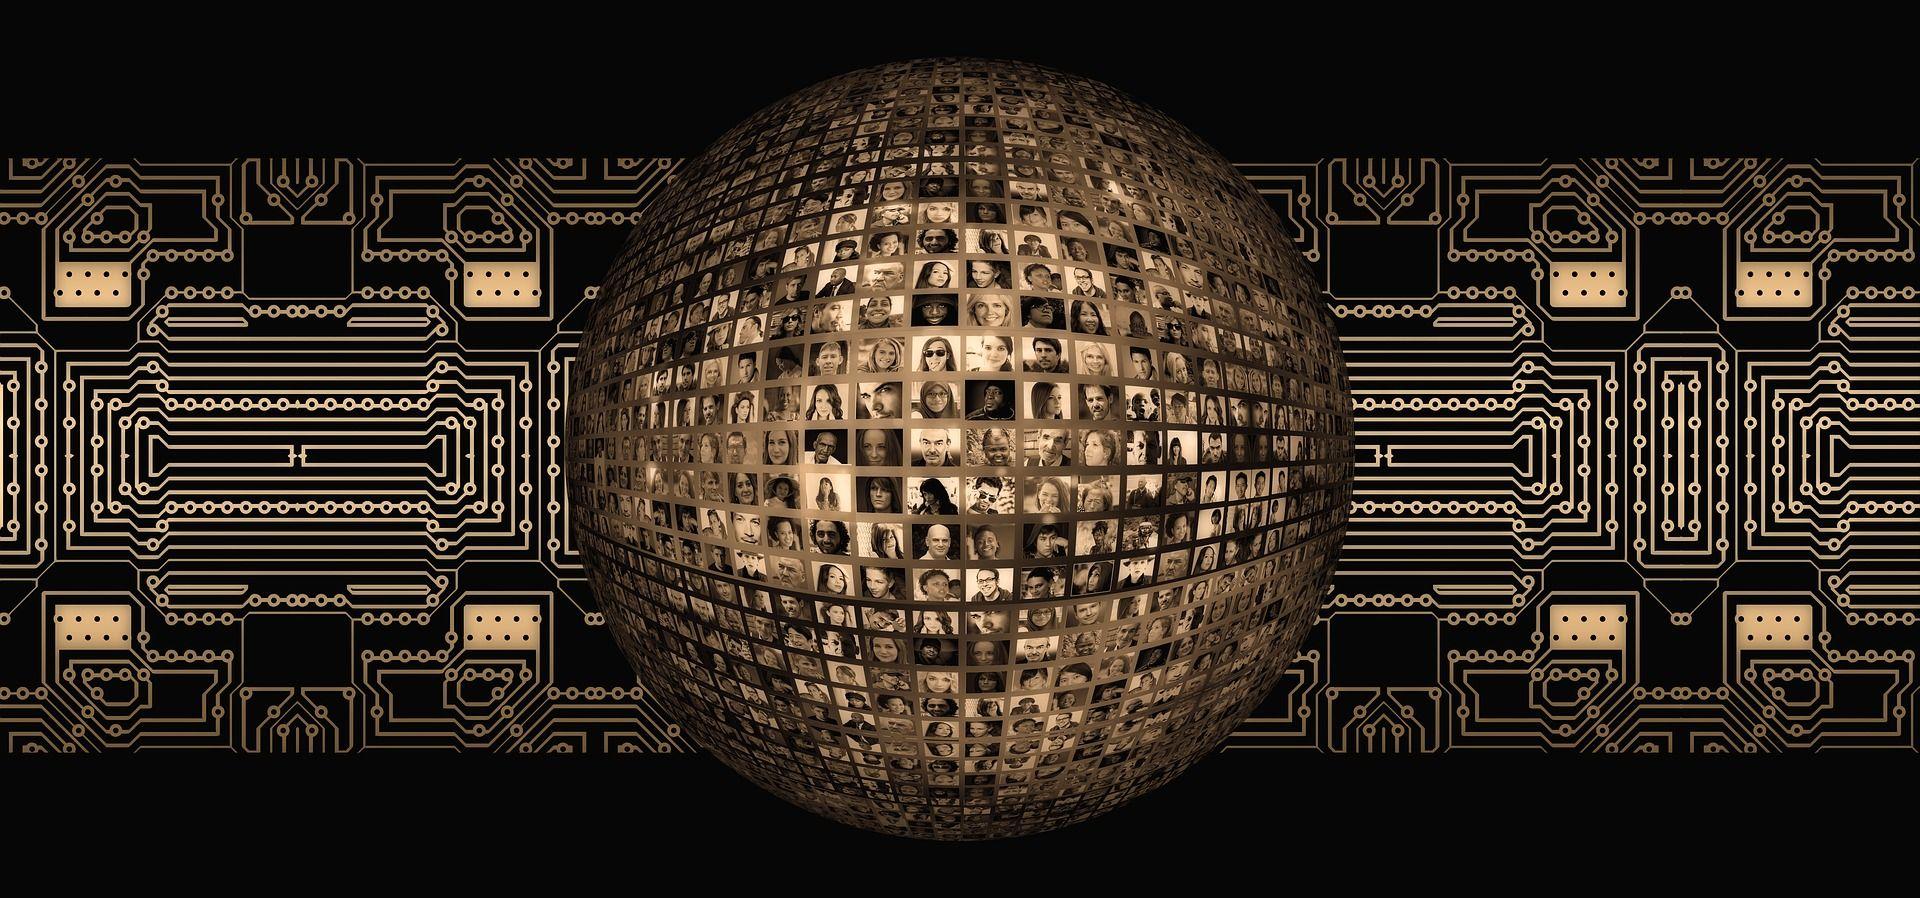 Trust makes the digital world go round